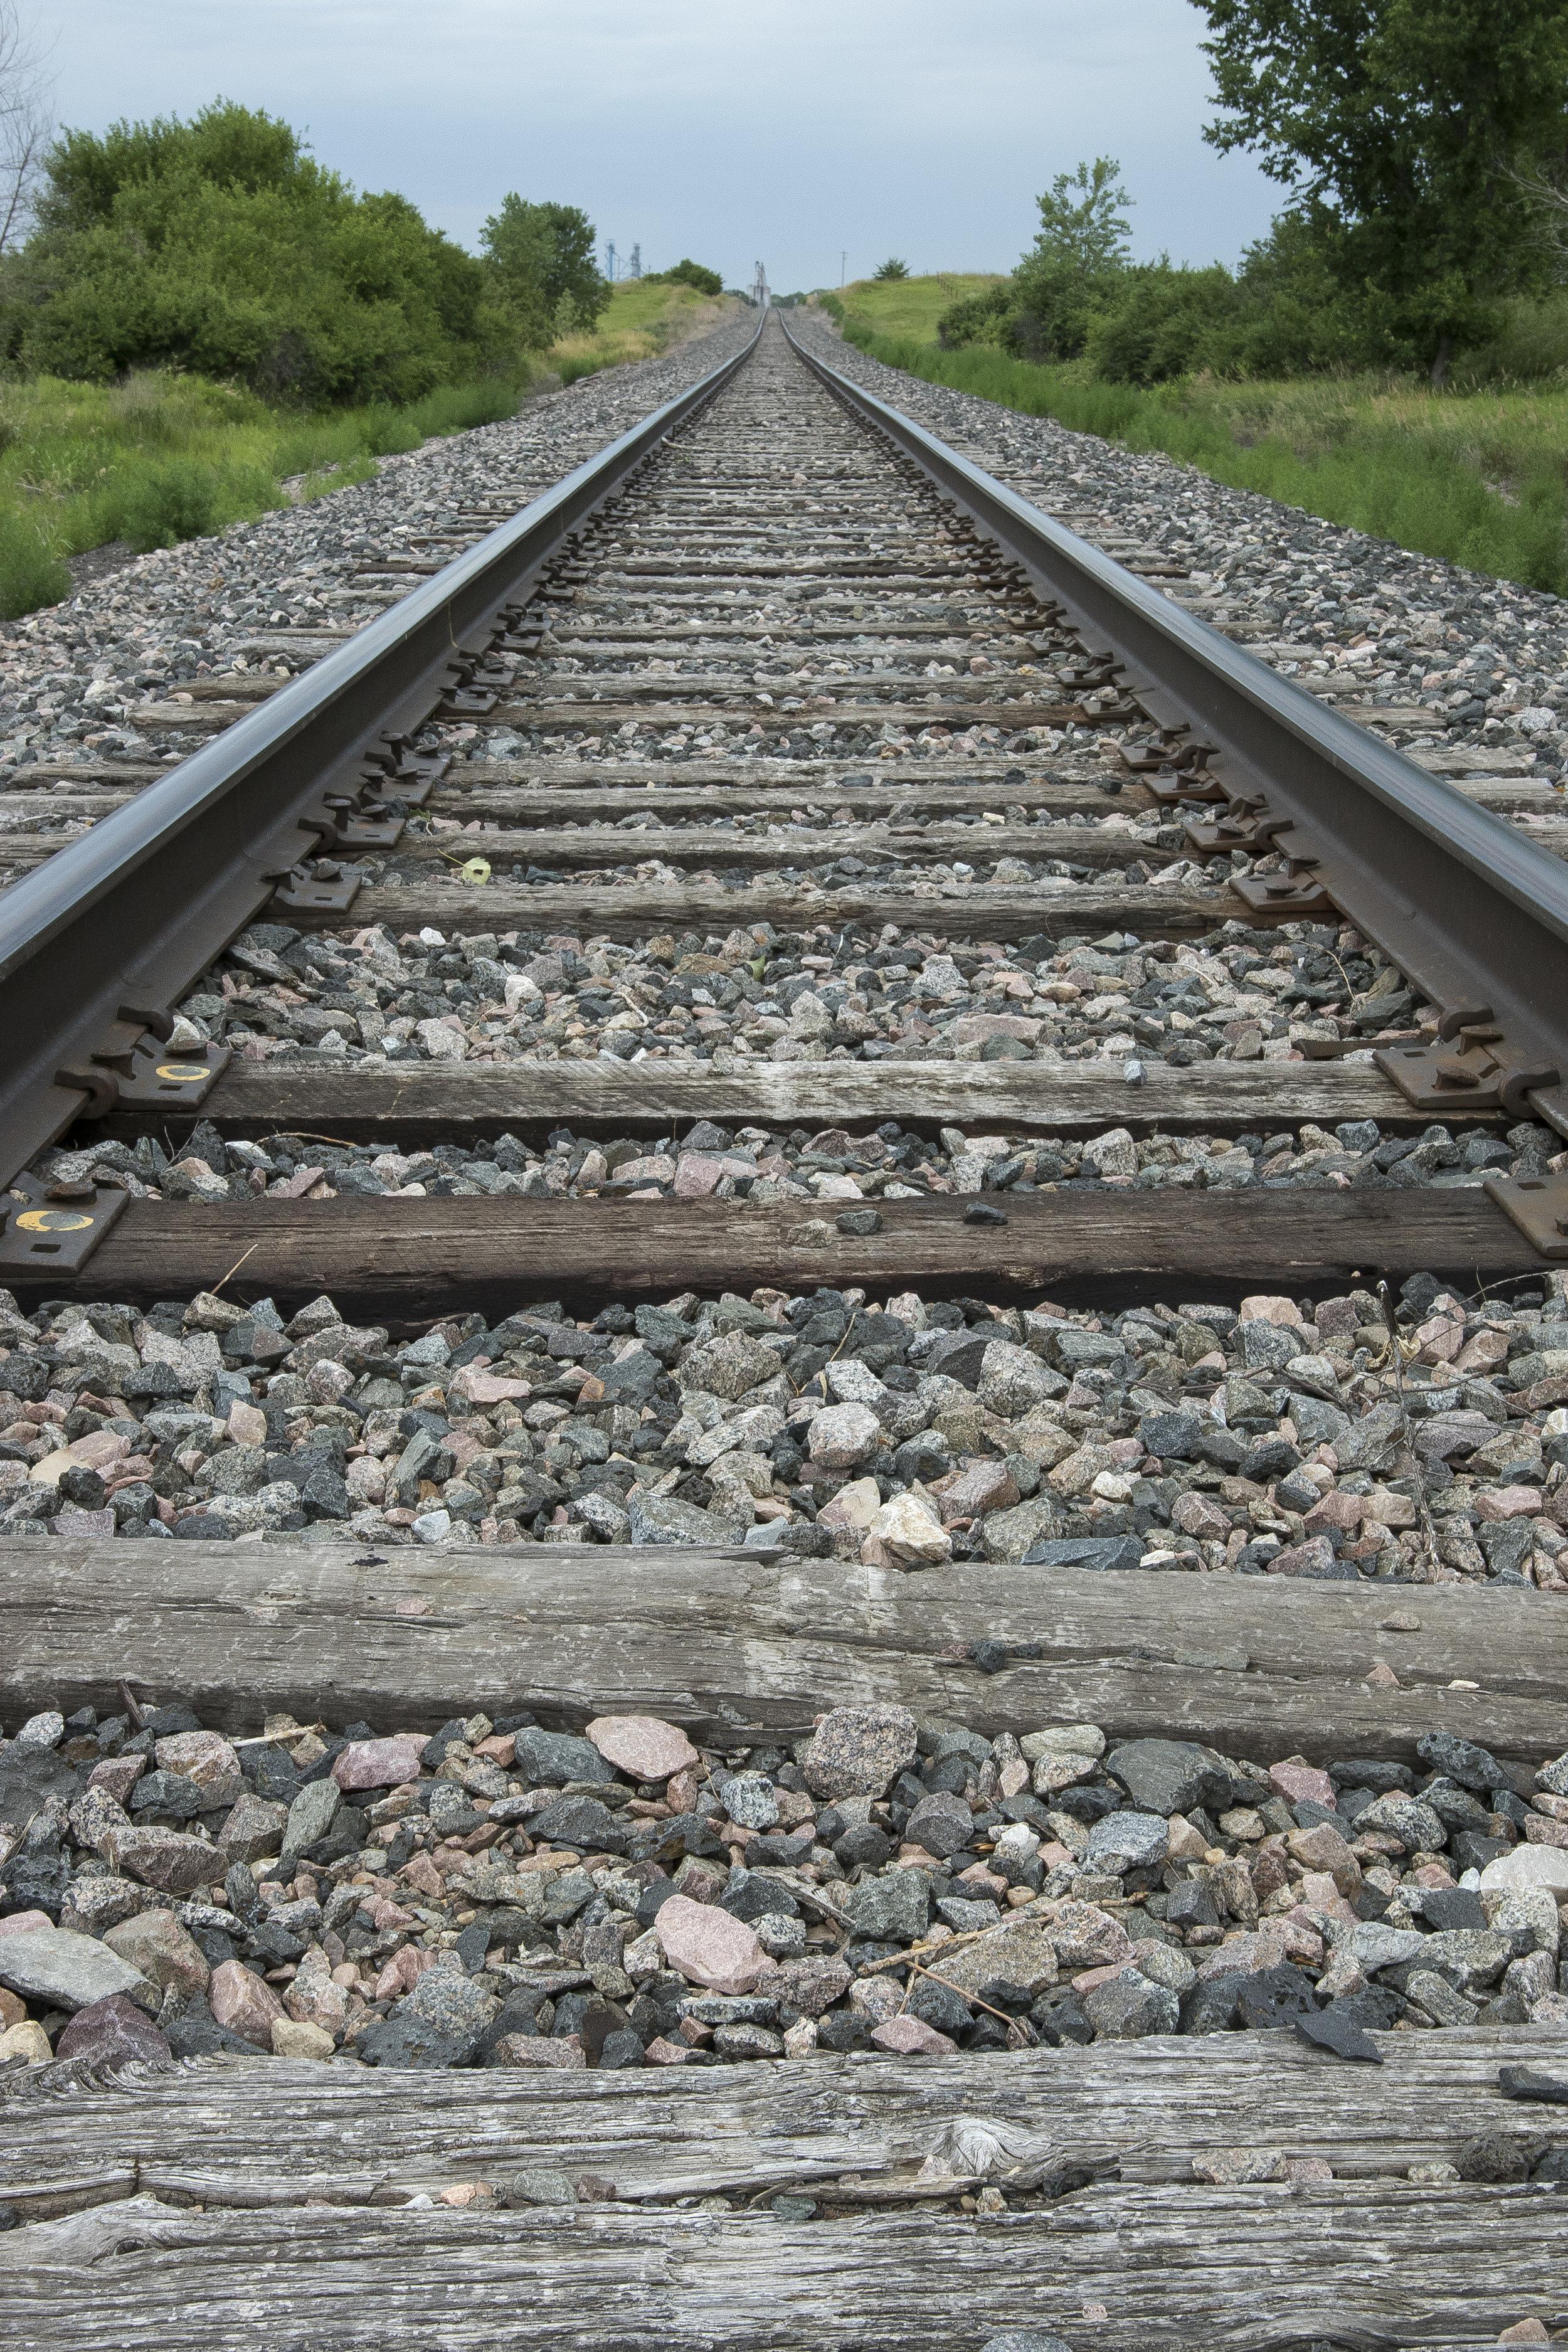 - The railway running between Seward and Staplehurst, Nebraska on July 7, 2017.